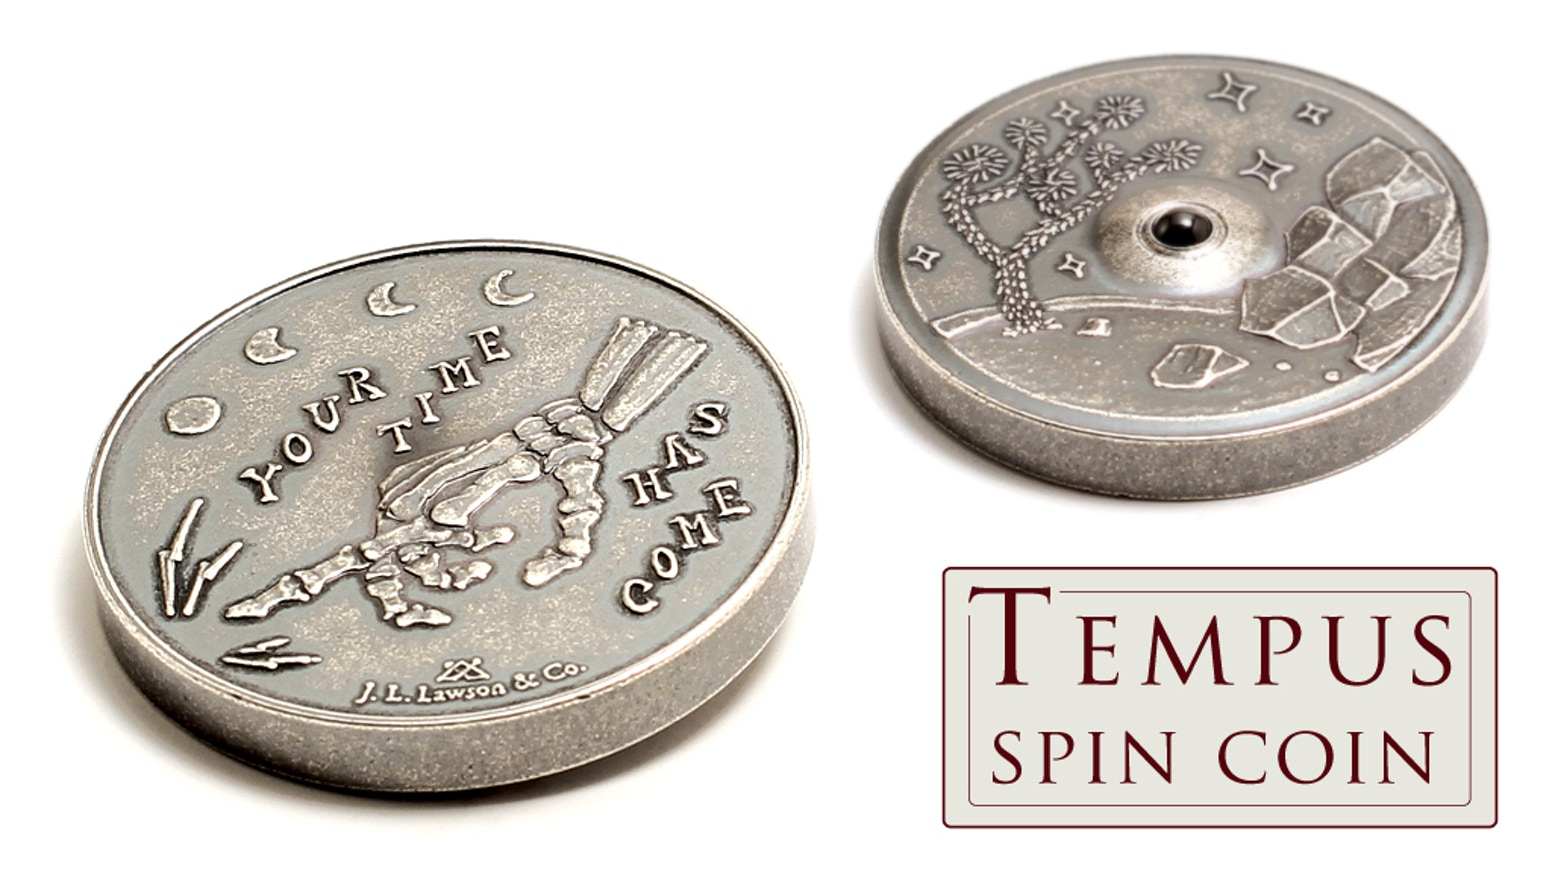 Spins Coin